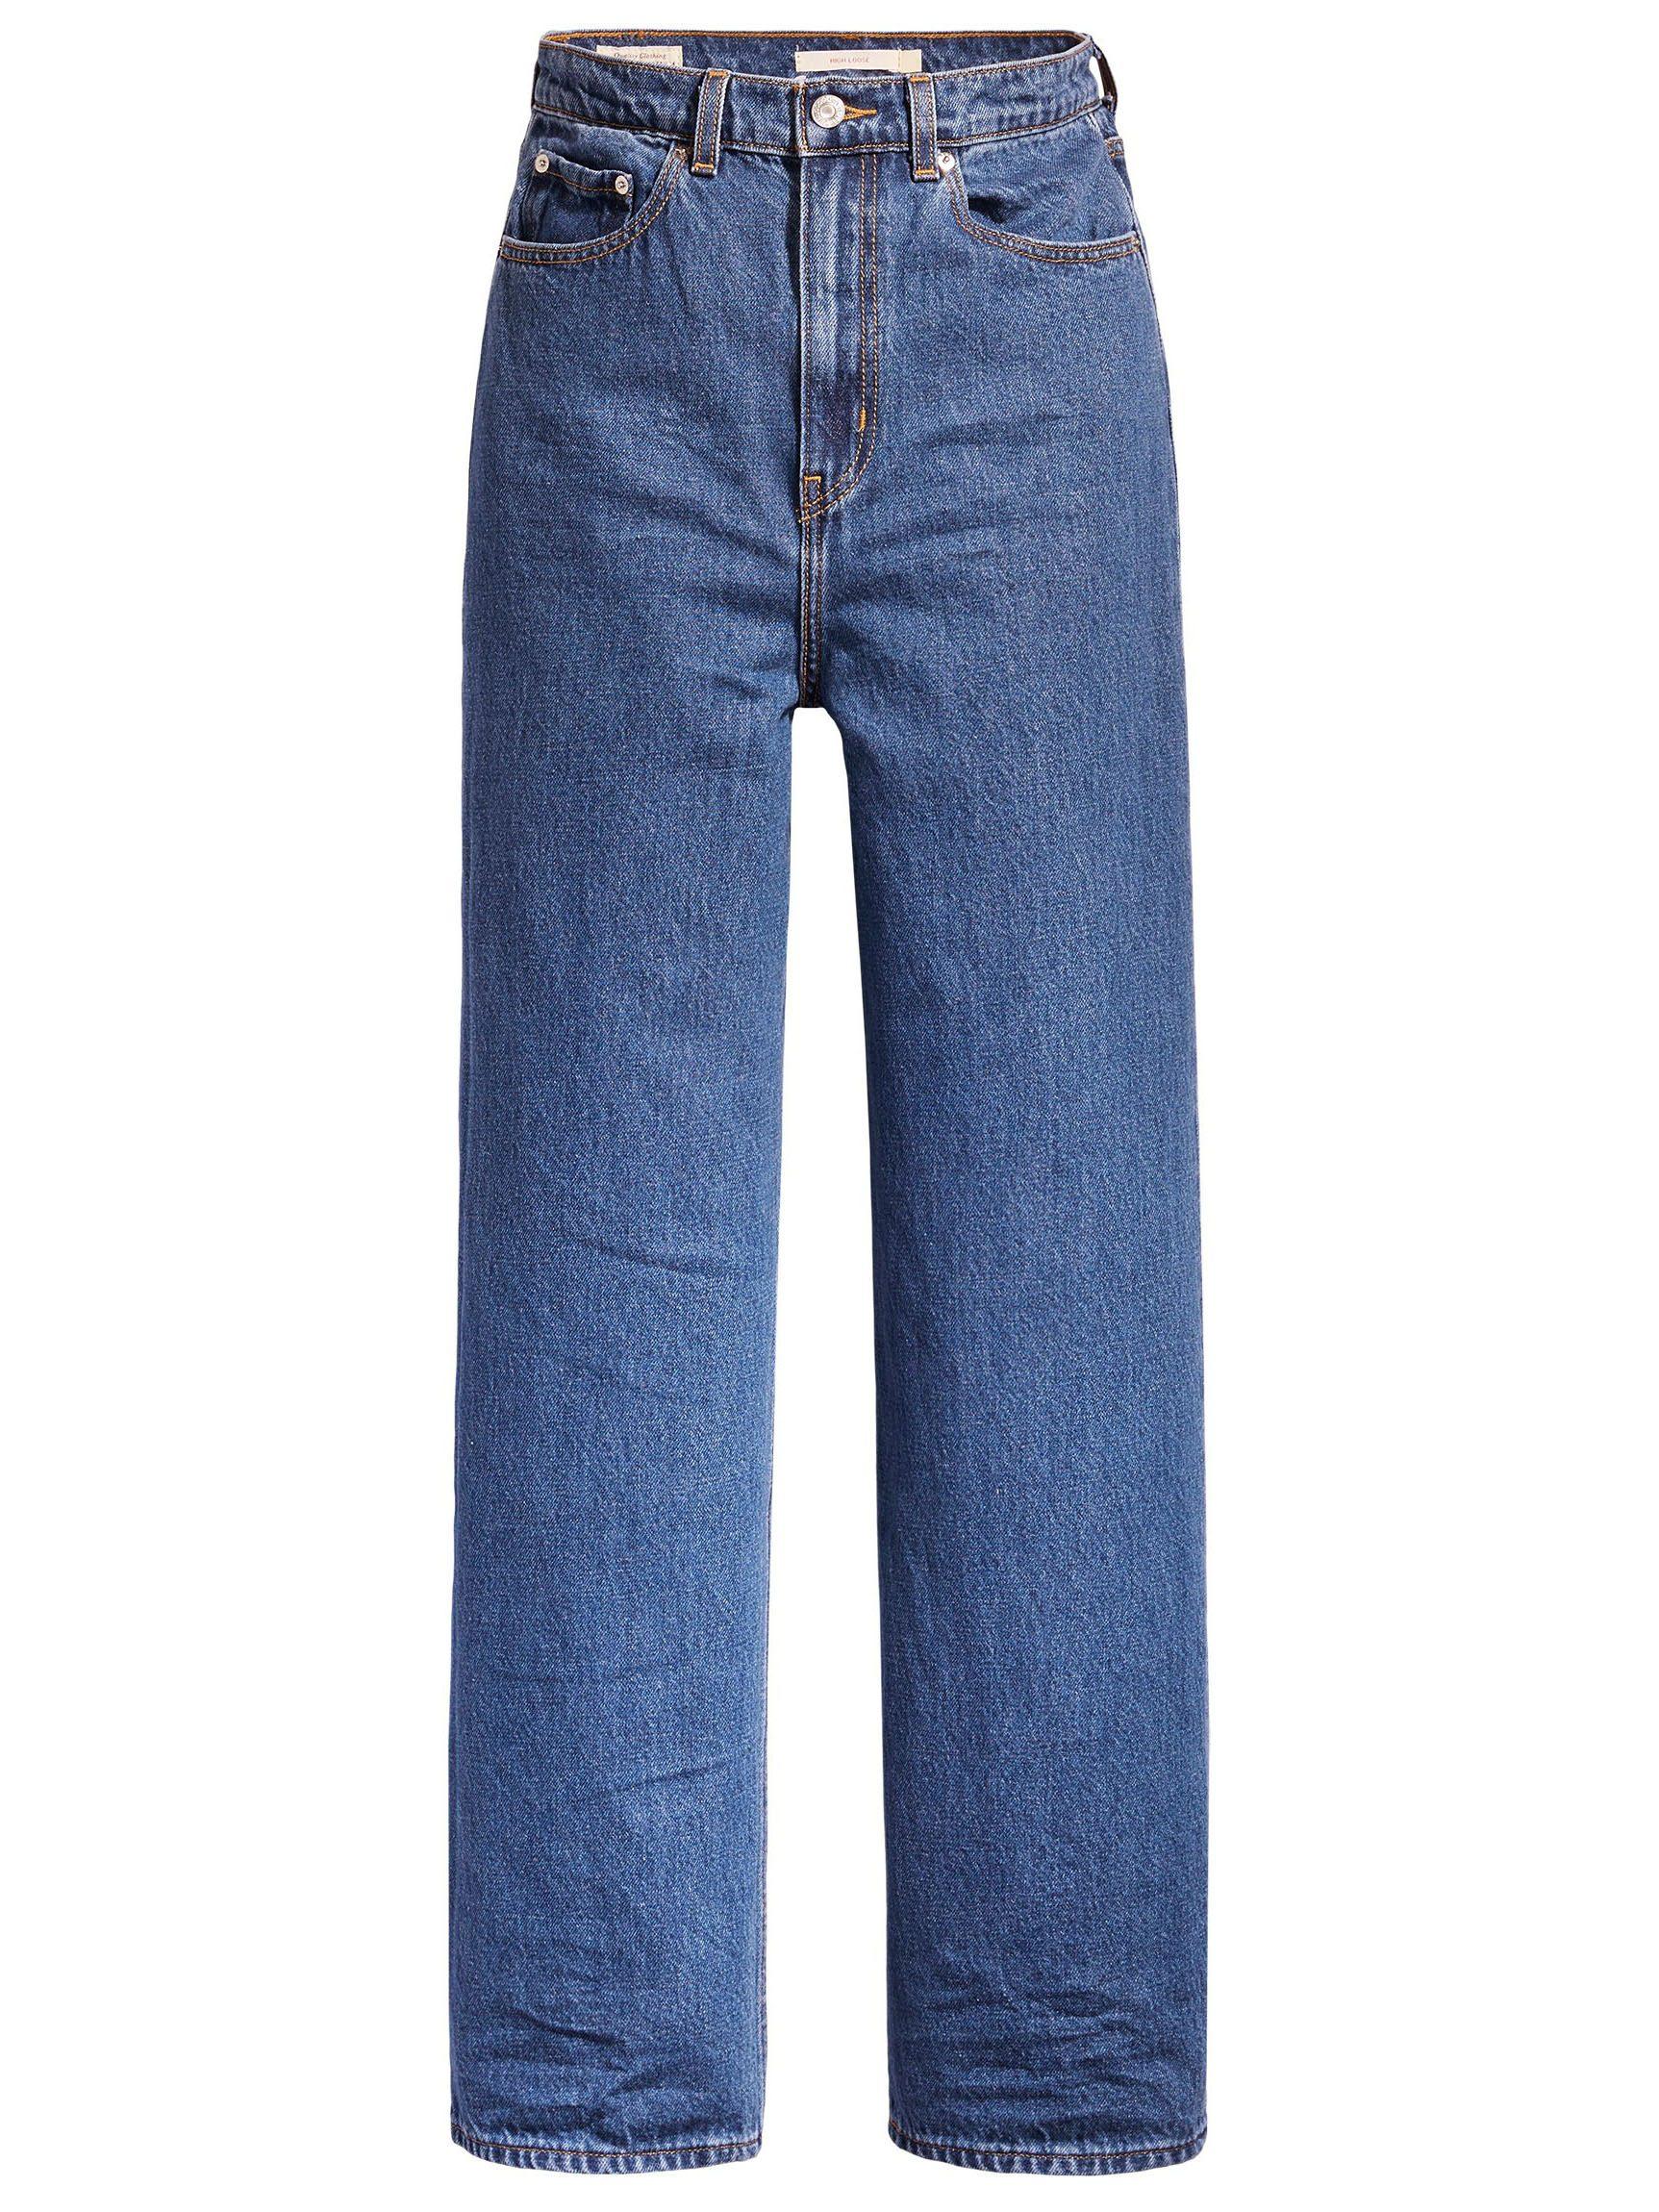 Mode News Januar 2021 Levi's High Loose Jeans